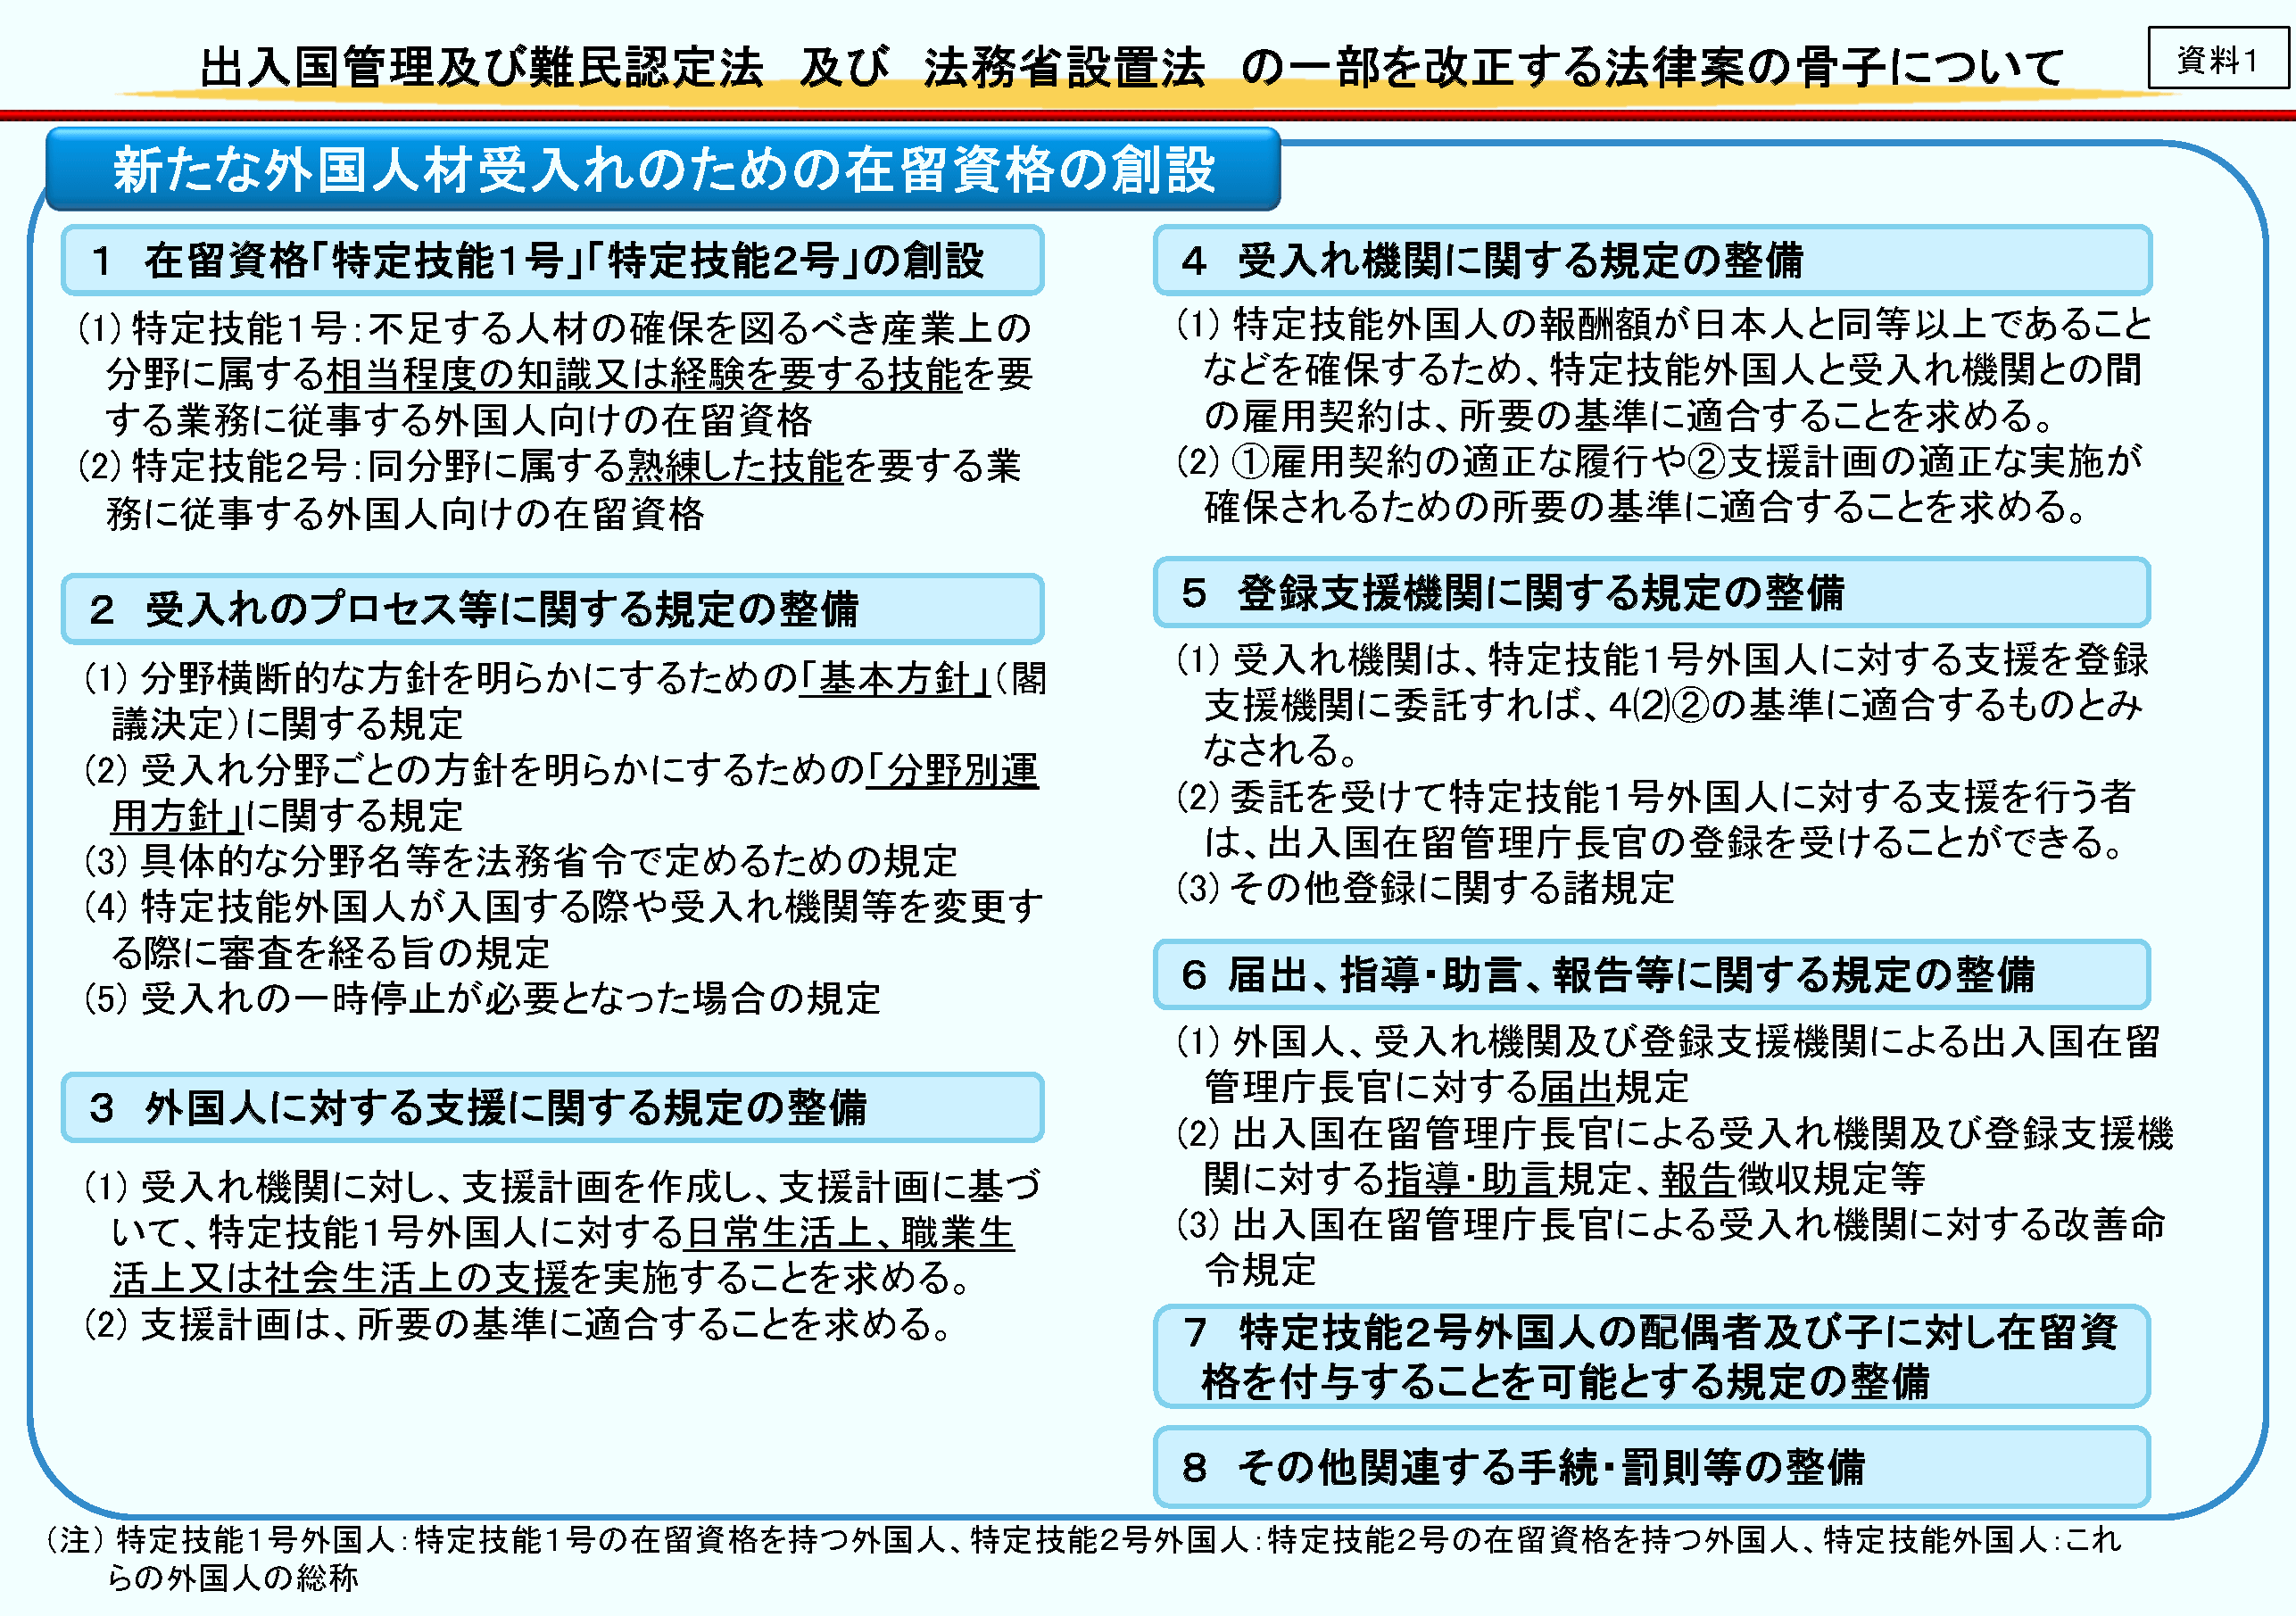 特定技能ビザ(在留資格)資料1